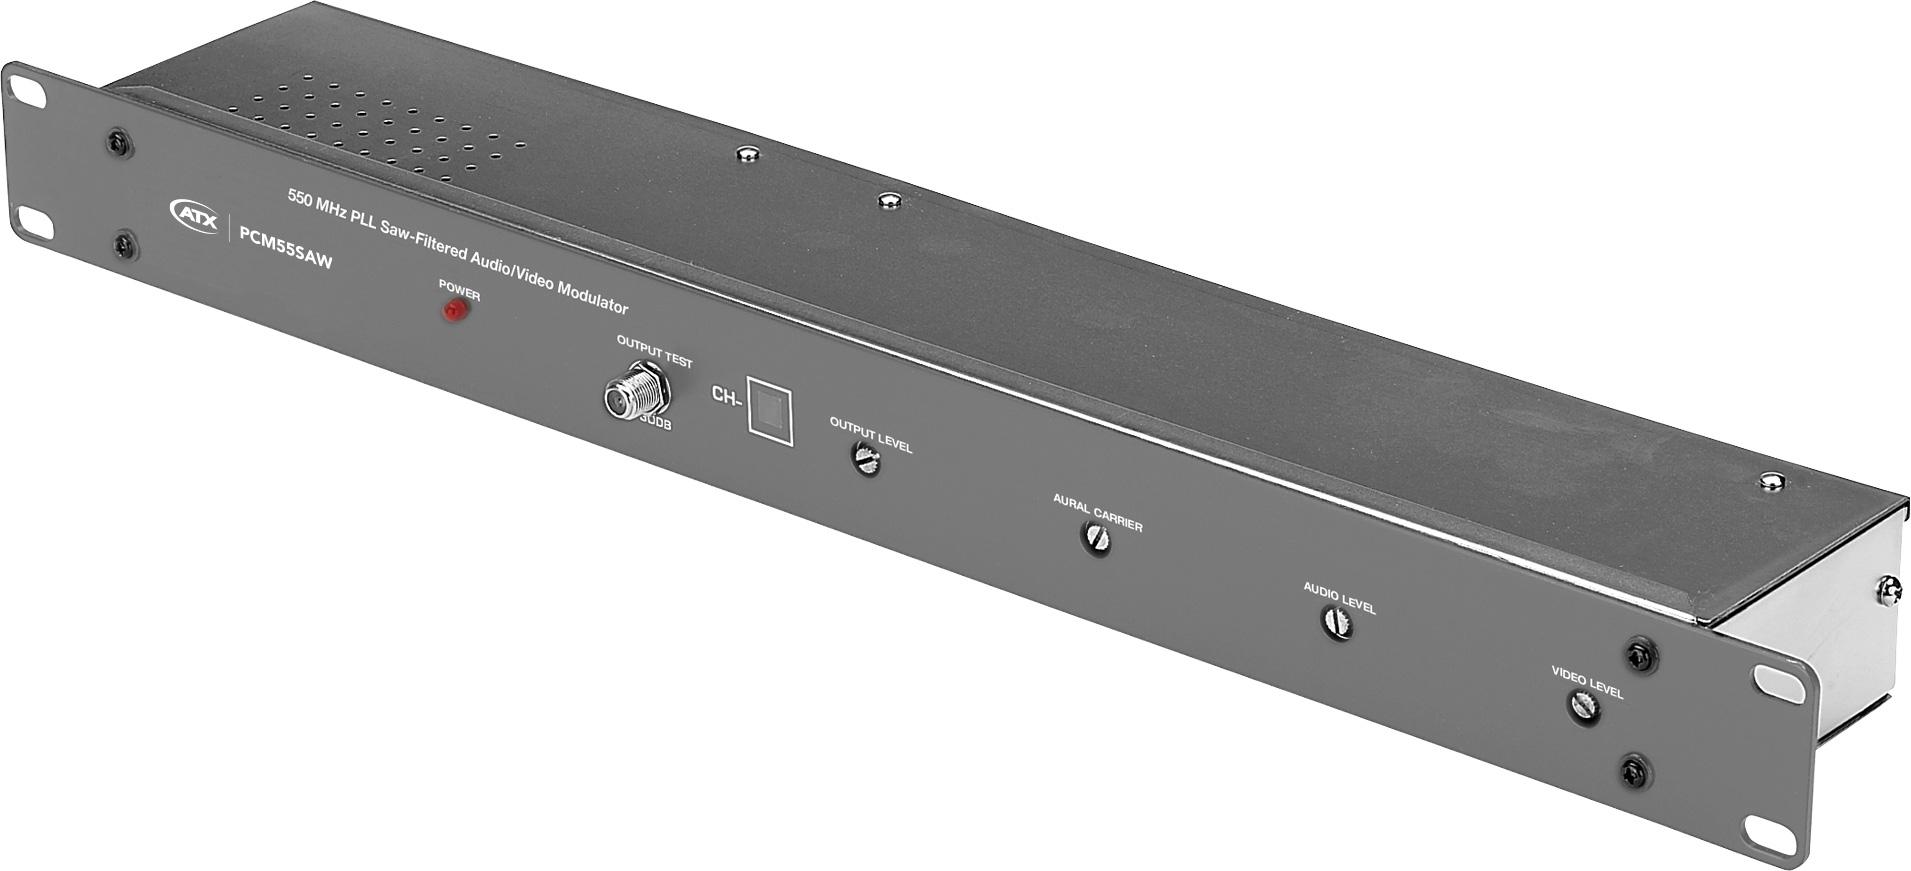 1 Channel Crystal A/V Modulator - Channel 35 PM-PCM55SAW-35